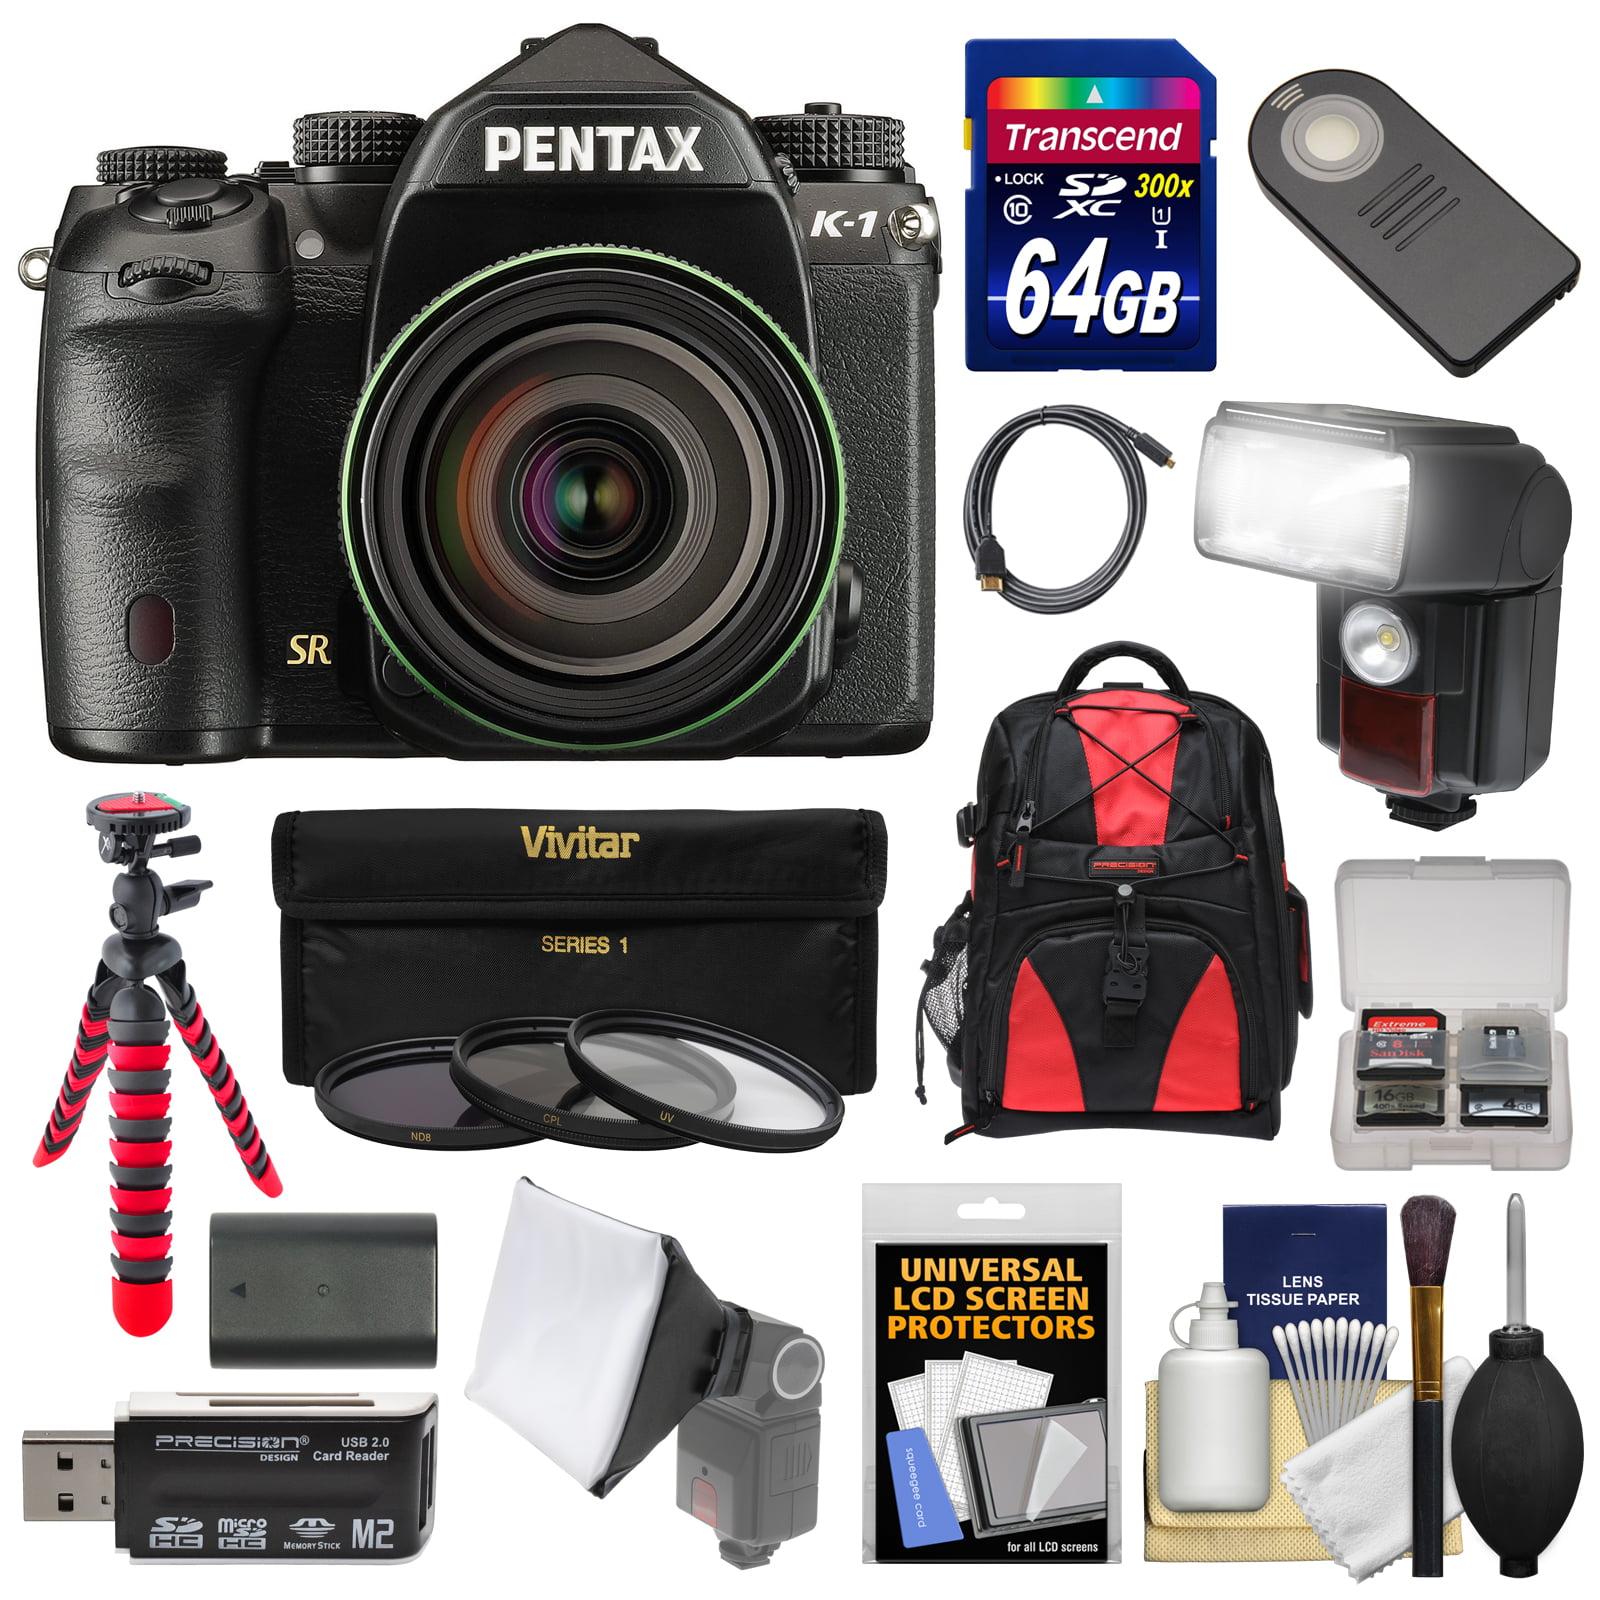 Pentax K-1 Mark II Full Frame Wi-Fi Digital SLR Camera & FA 28-105mm Lens with 64GB Card + Battery + Flash +... by Pentax